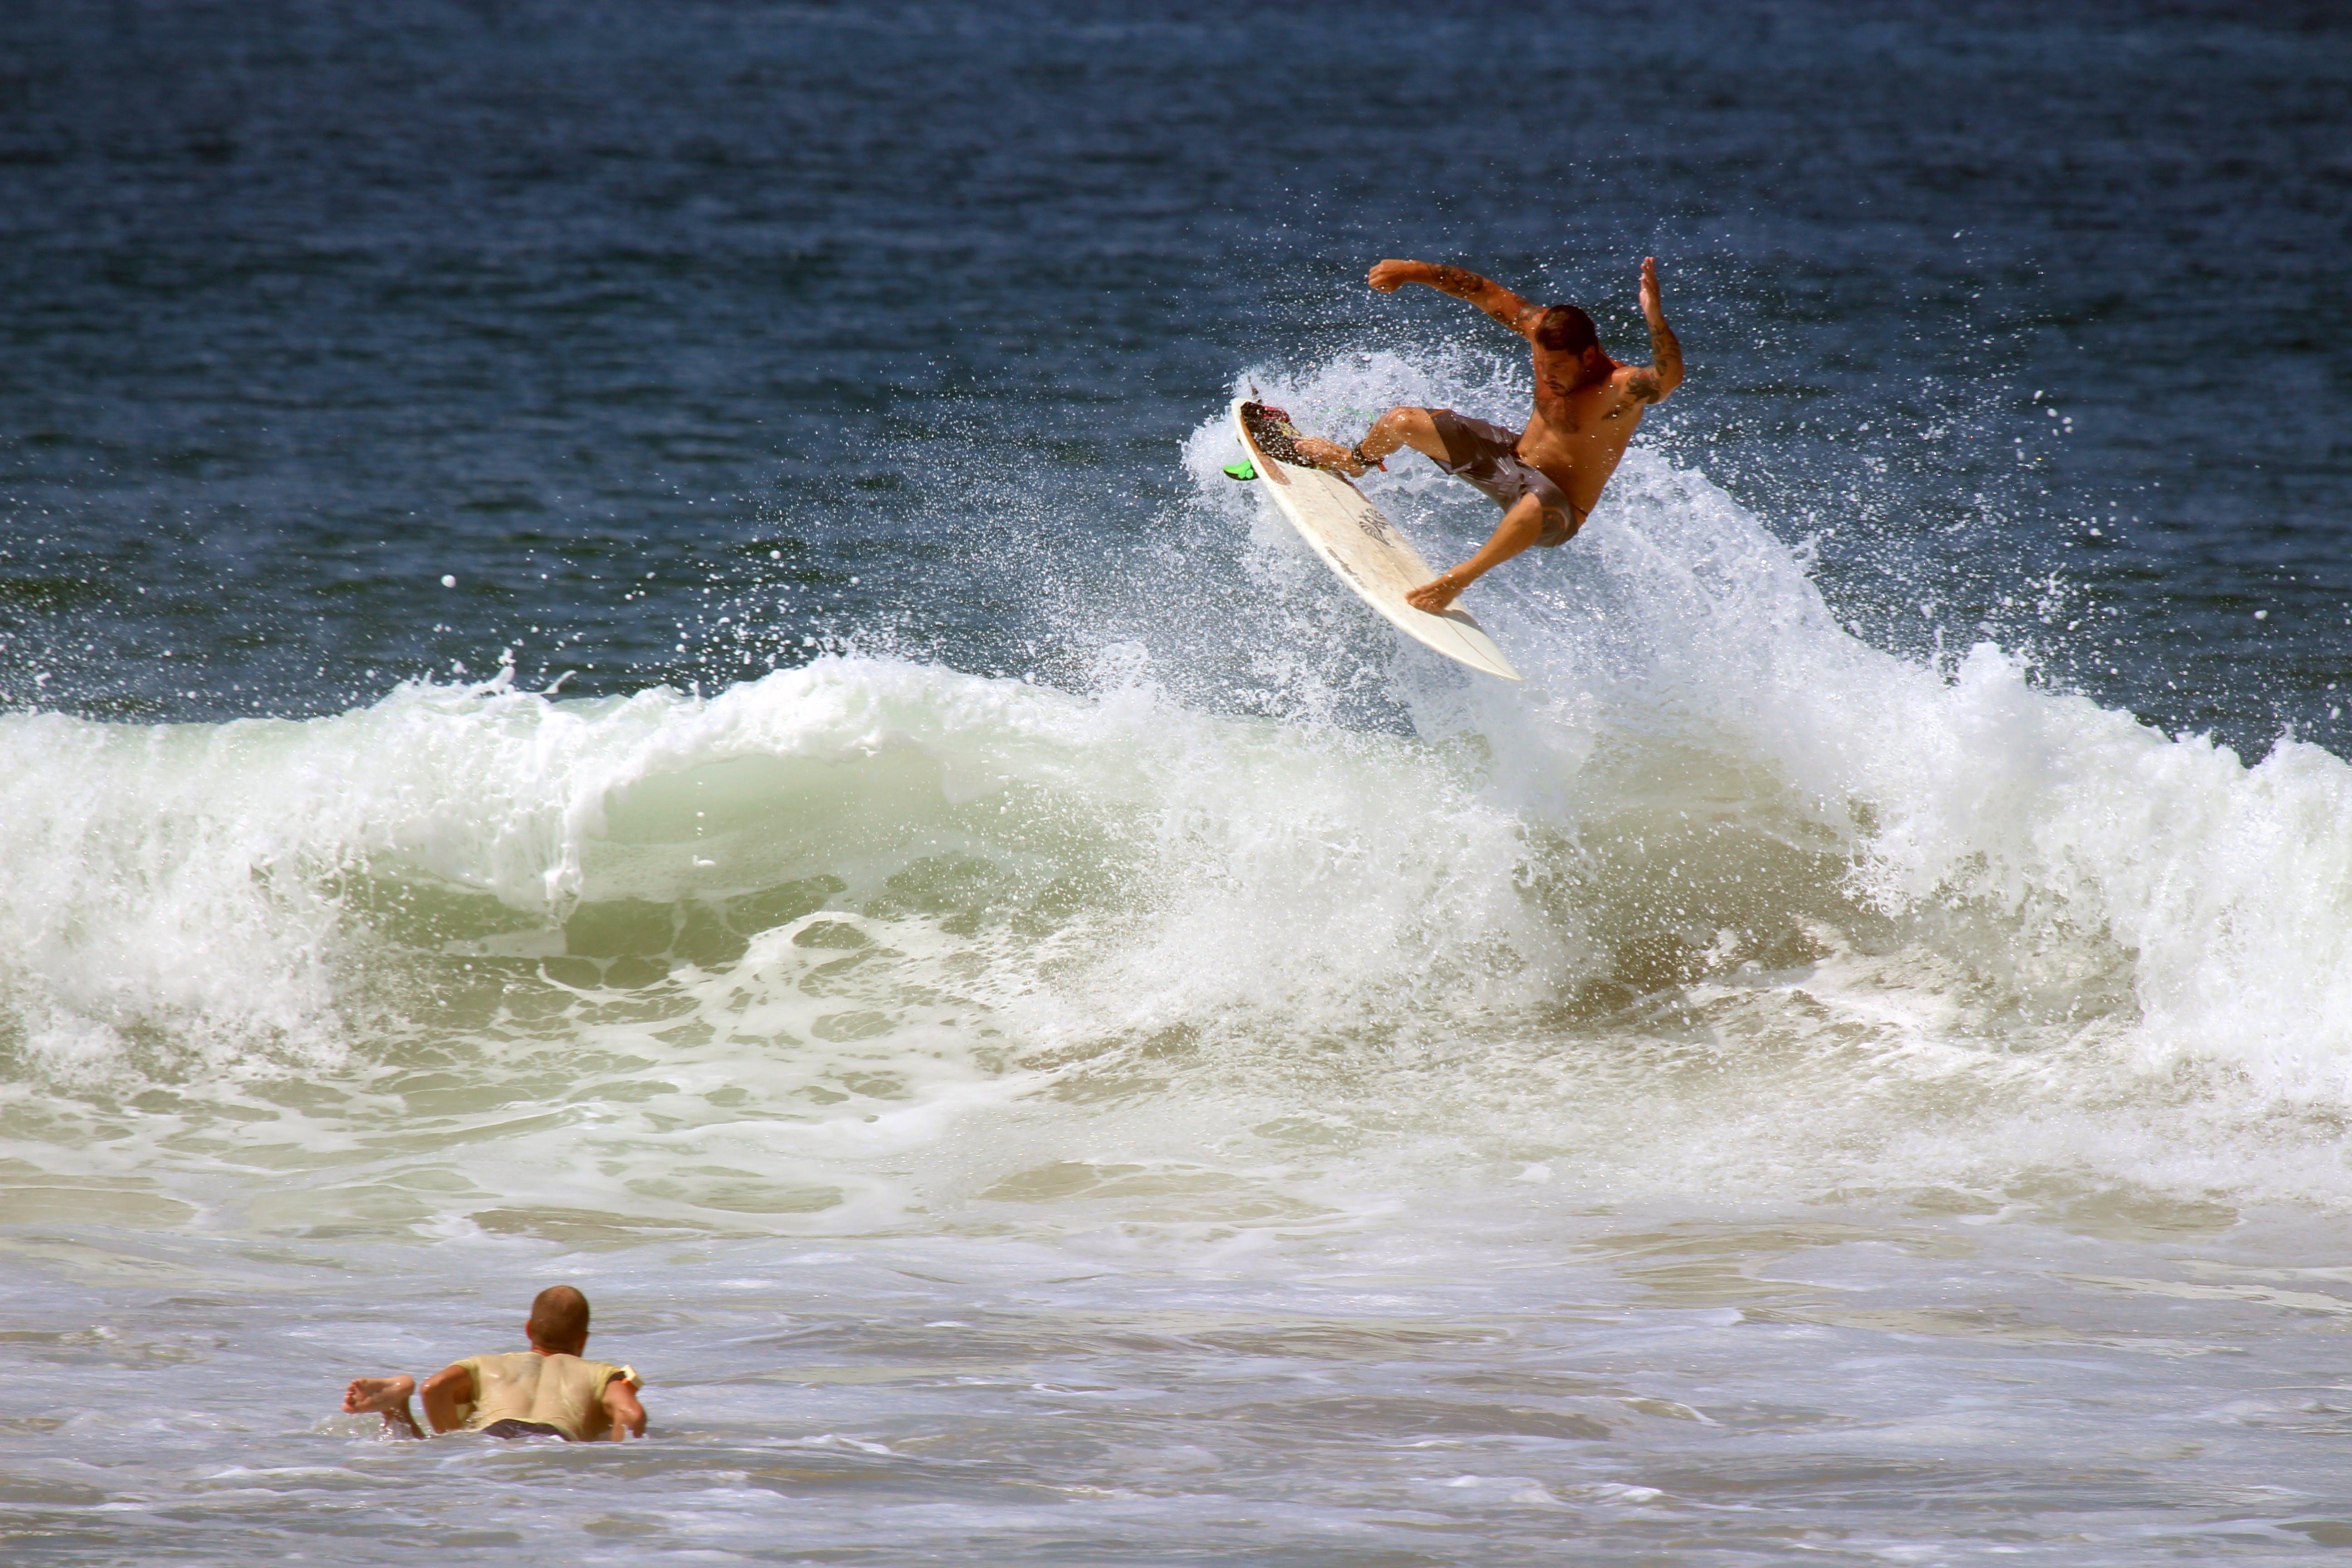 a surfer doing a jump through a wave